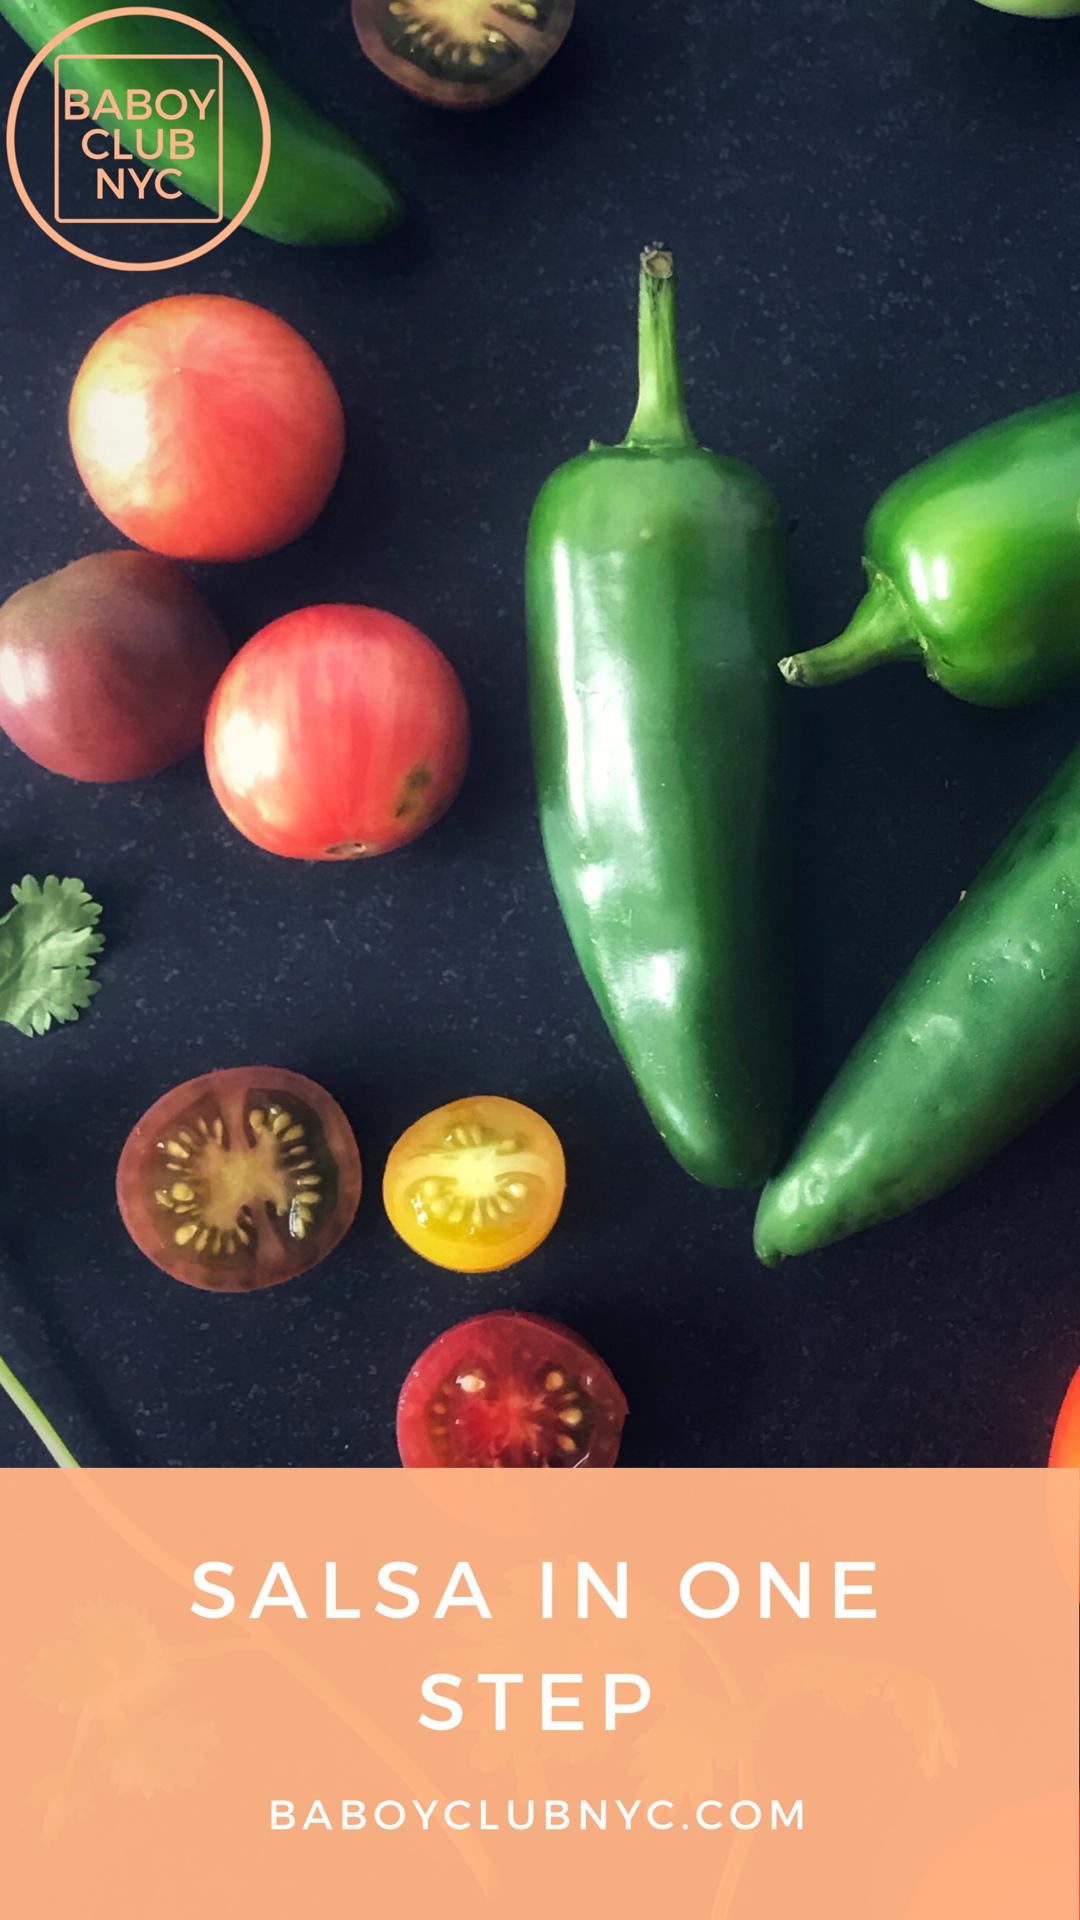 Fresh Salsa 5 Ingredients and 1 Step Easy salsa recipe